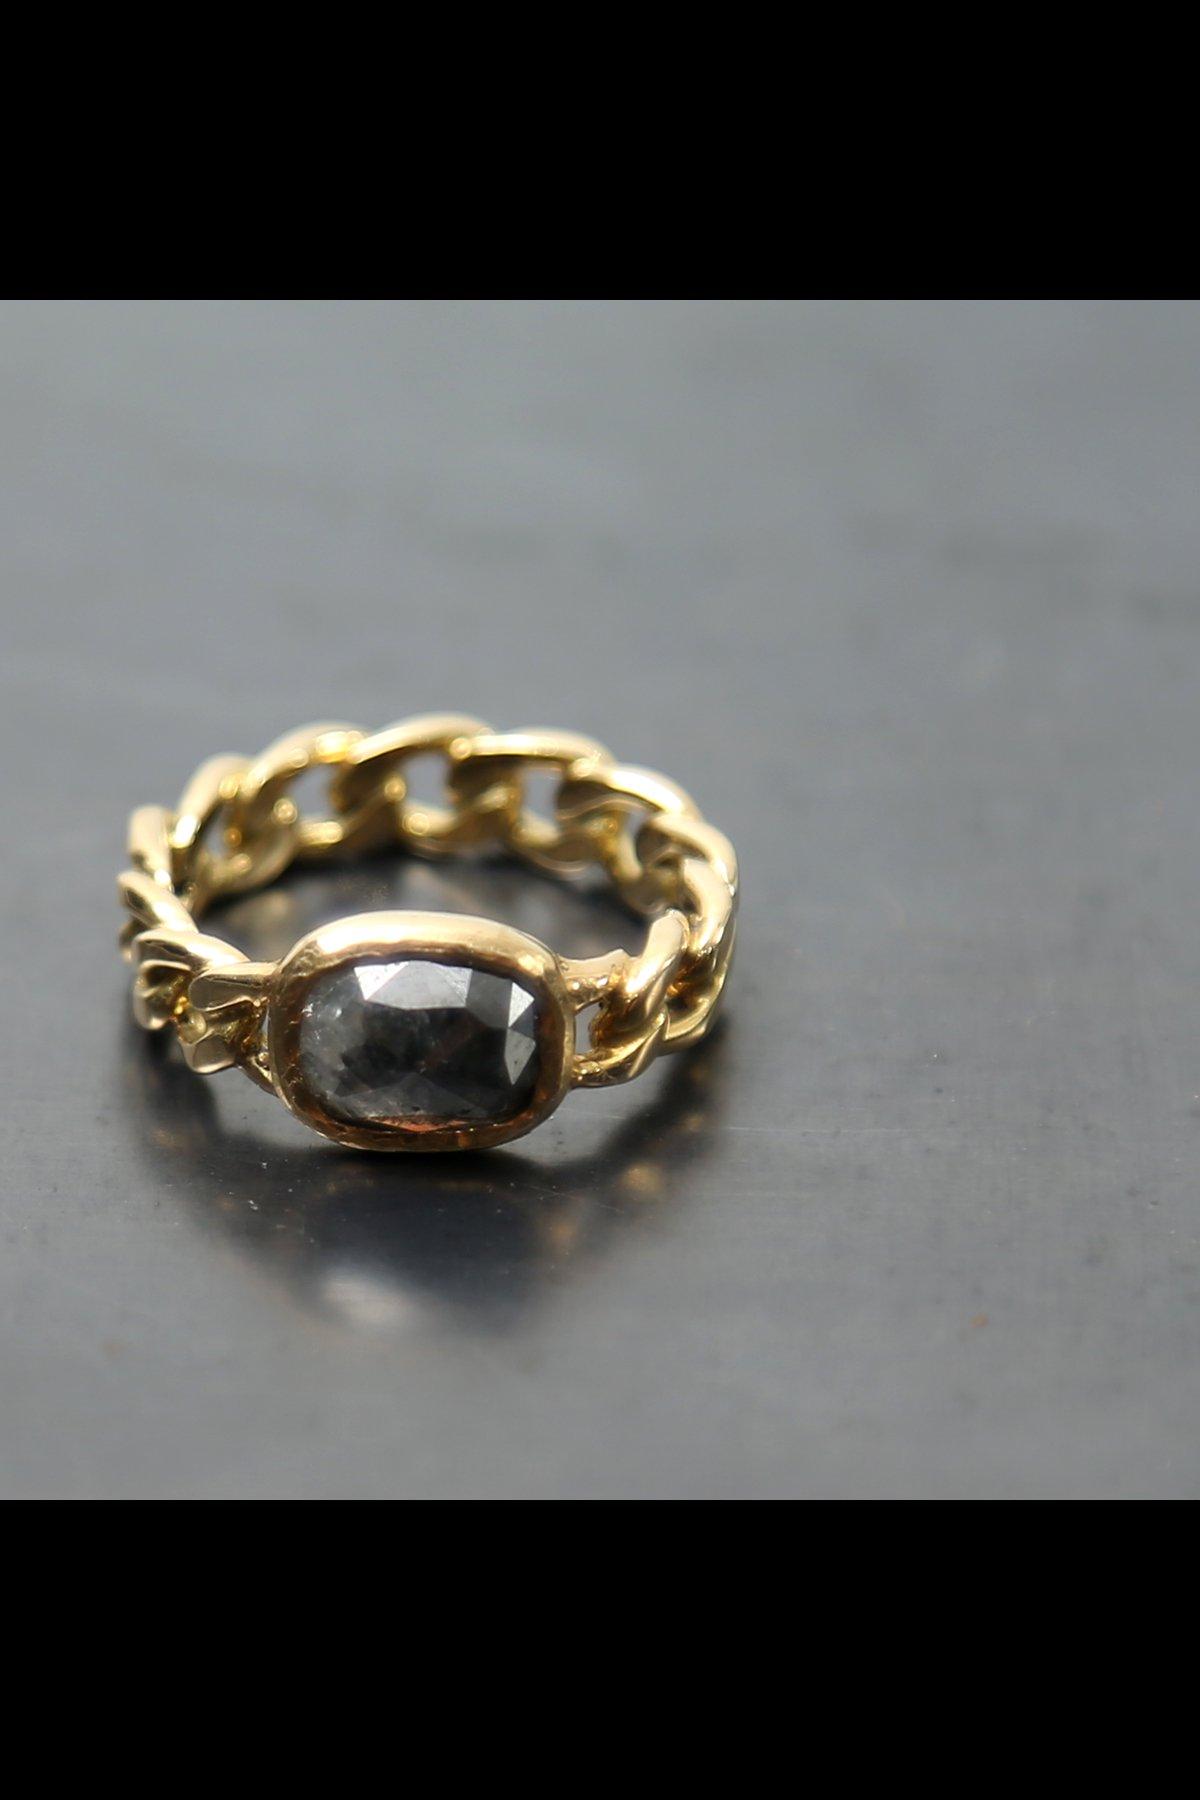 CLASSIC CHAIN DIAMOND RING N.8A-ODR1